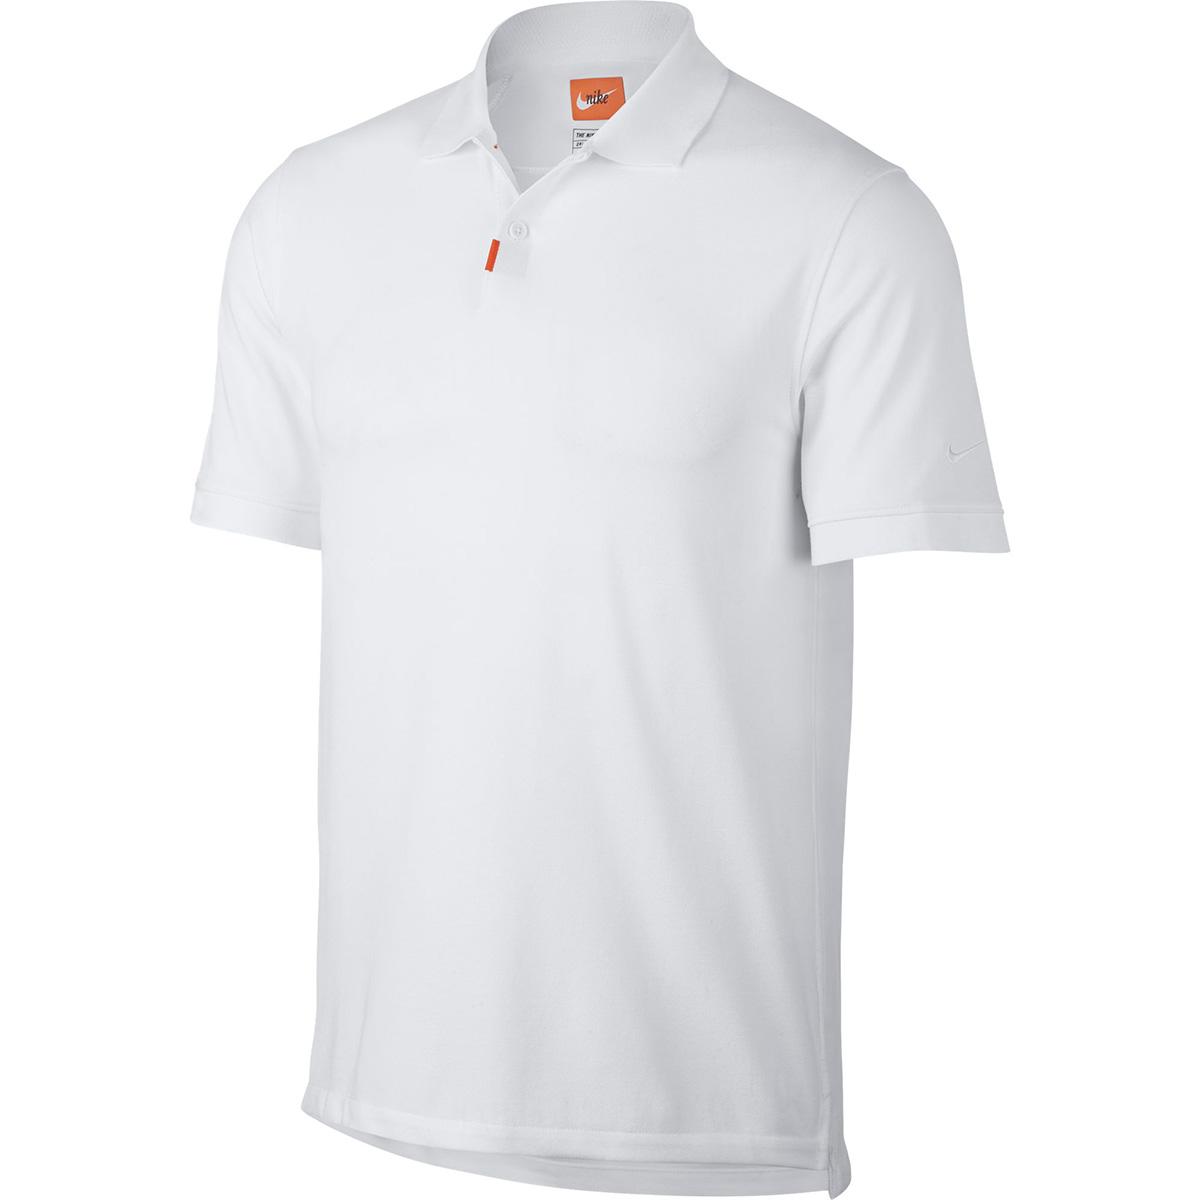 THE NIKE 半袖ポロシャツ